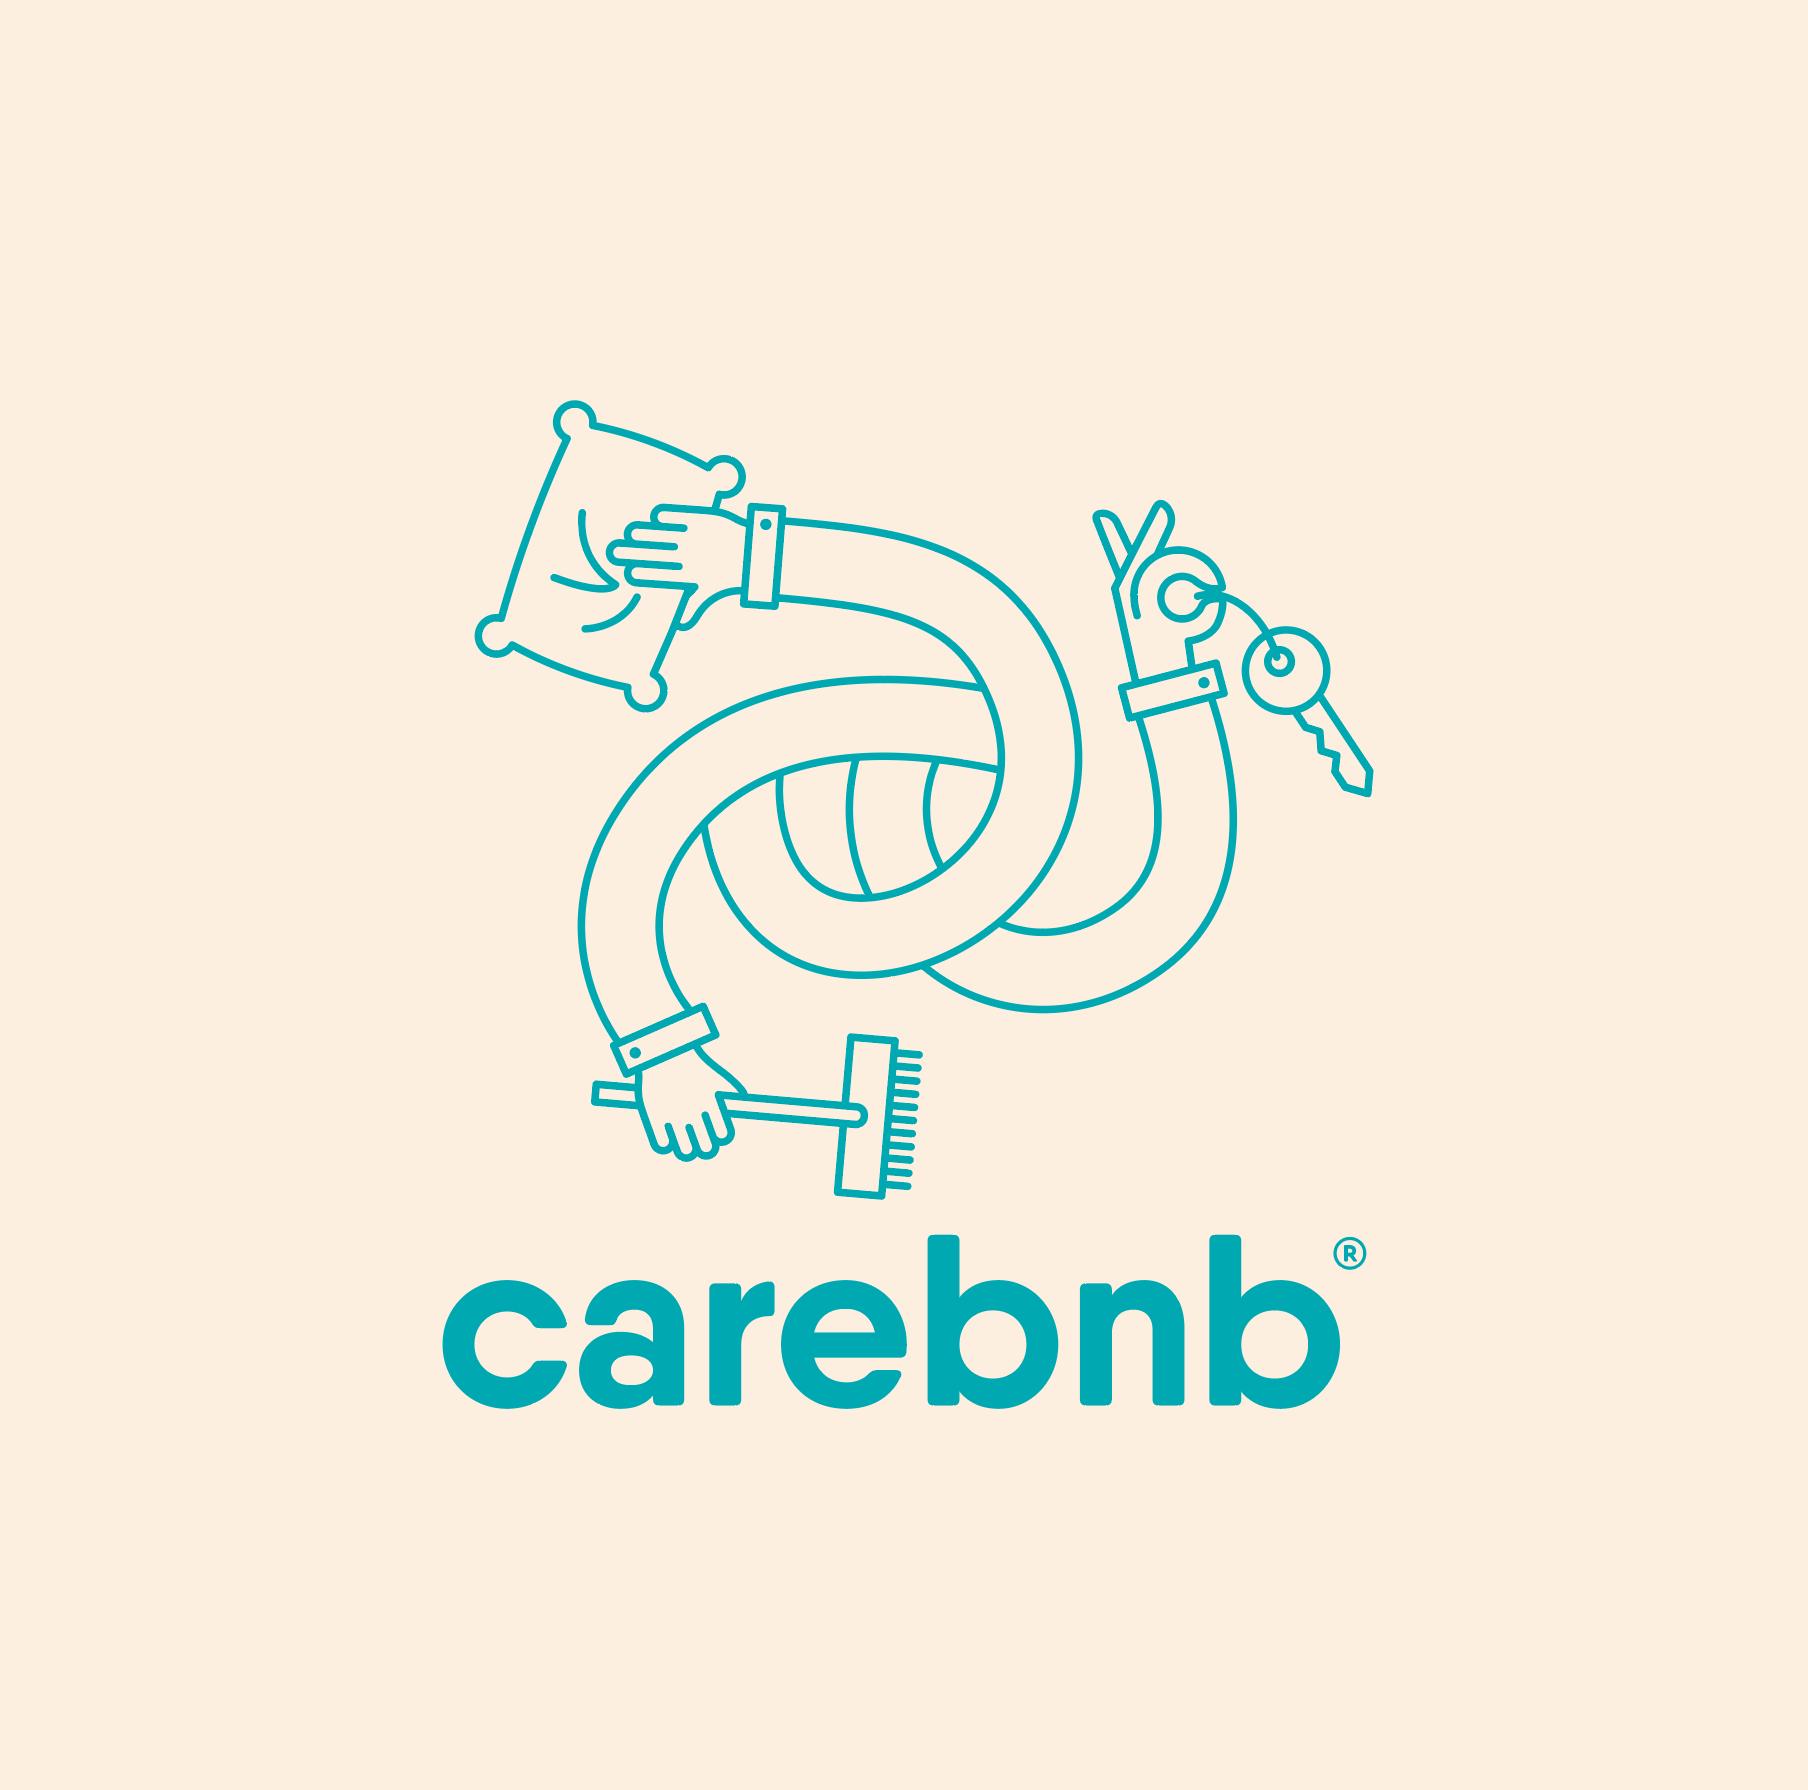 carebnb